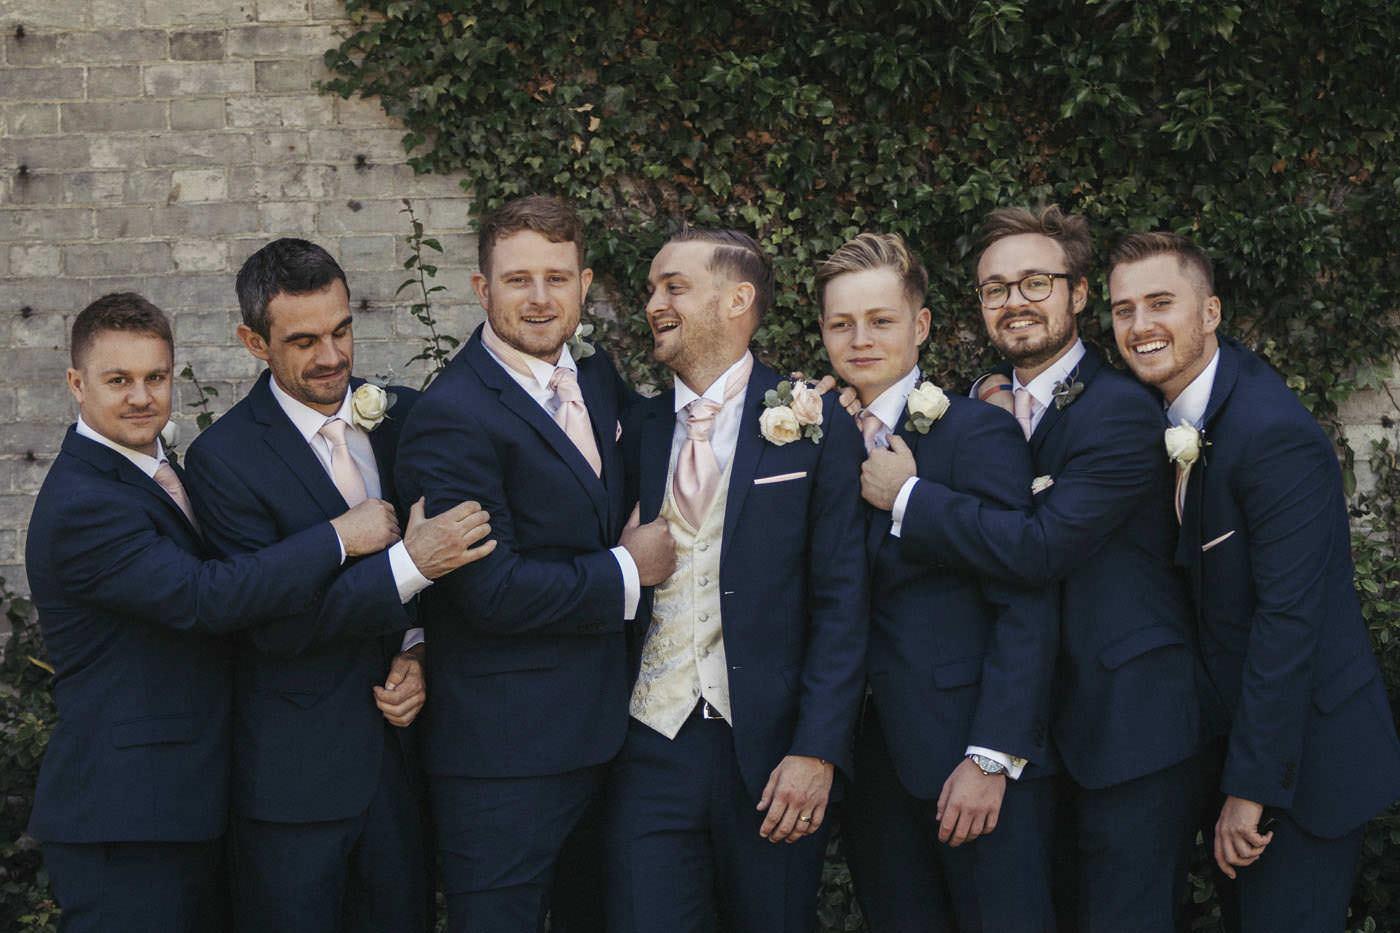 lukeemily foxhills wedding photographer 0066